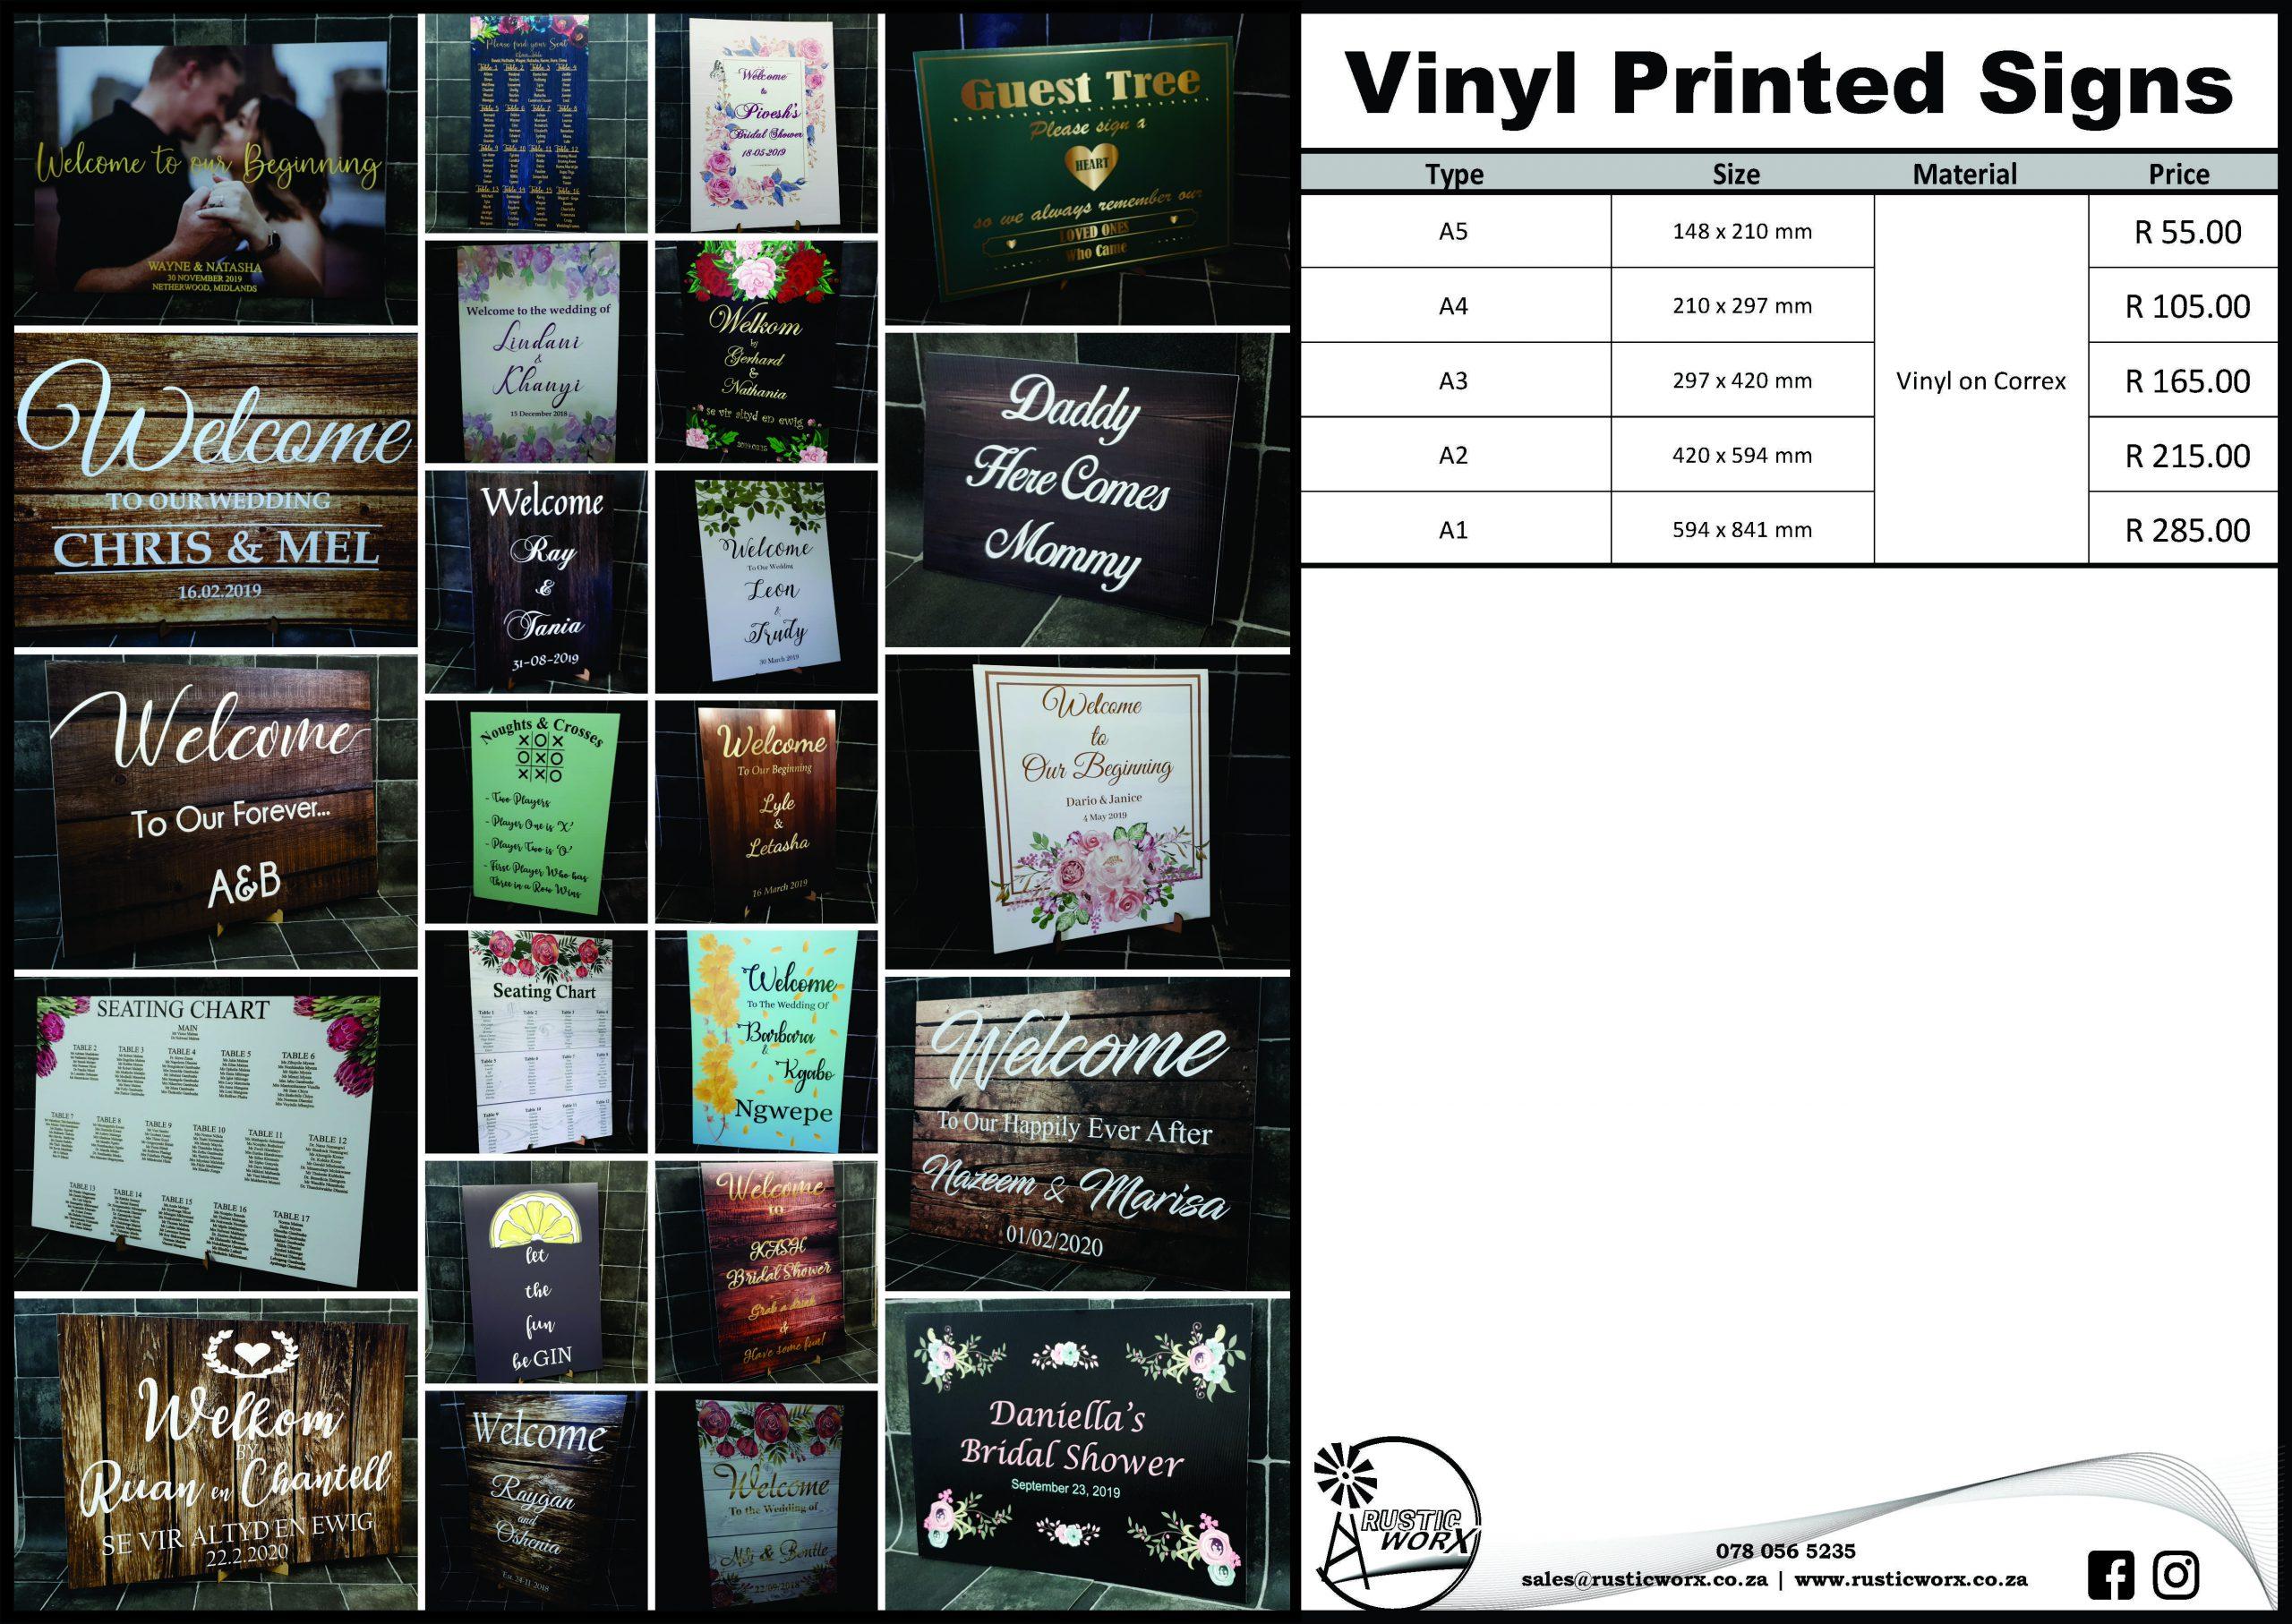 19.3 Signs Printed